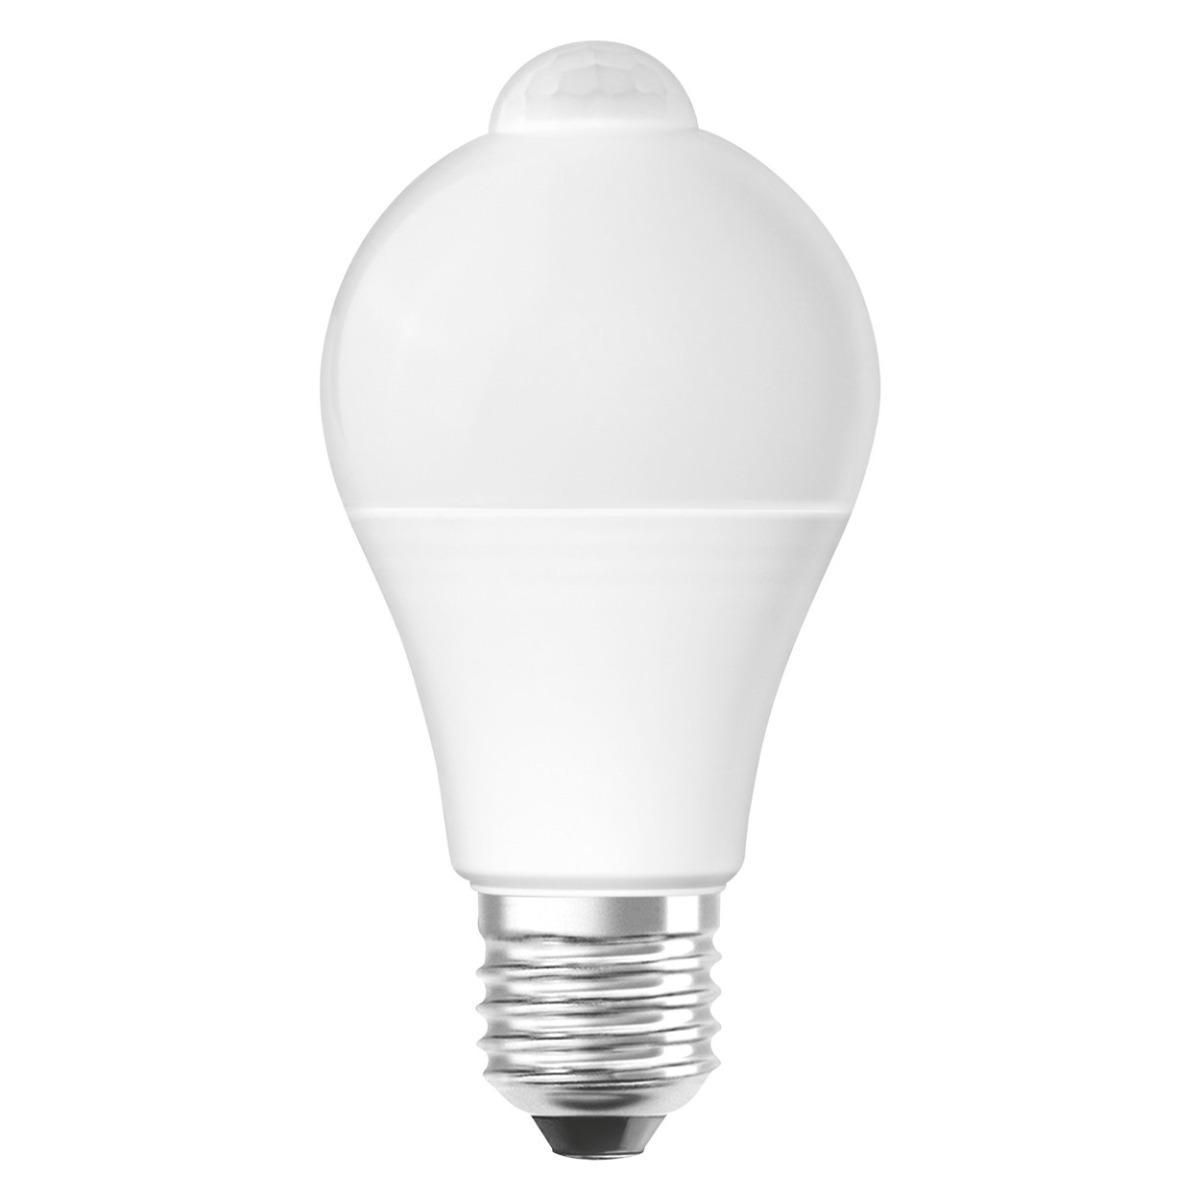 LED žárovka LED A60 E27 9W = 60W 2700K Teplá bílá 806lm pohybové čidlo STAR OSRAM OSRLEDC0105